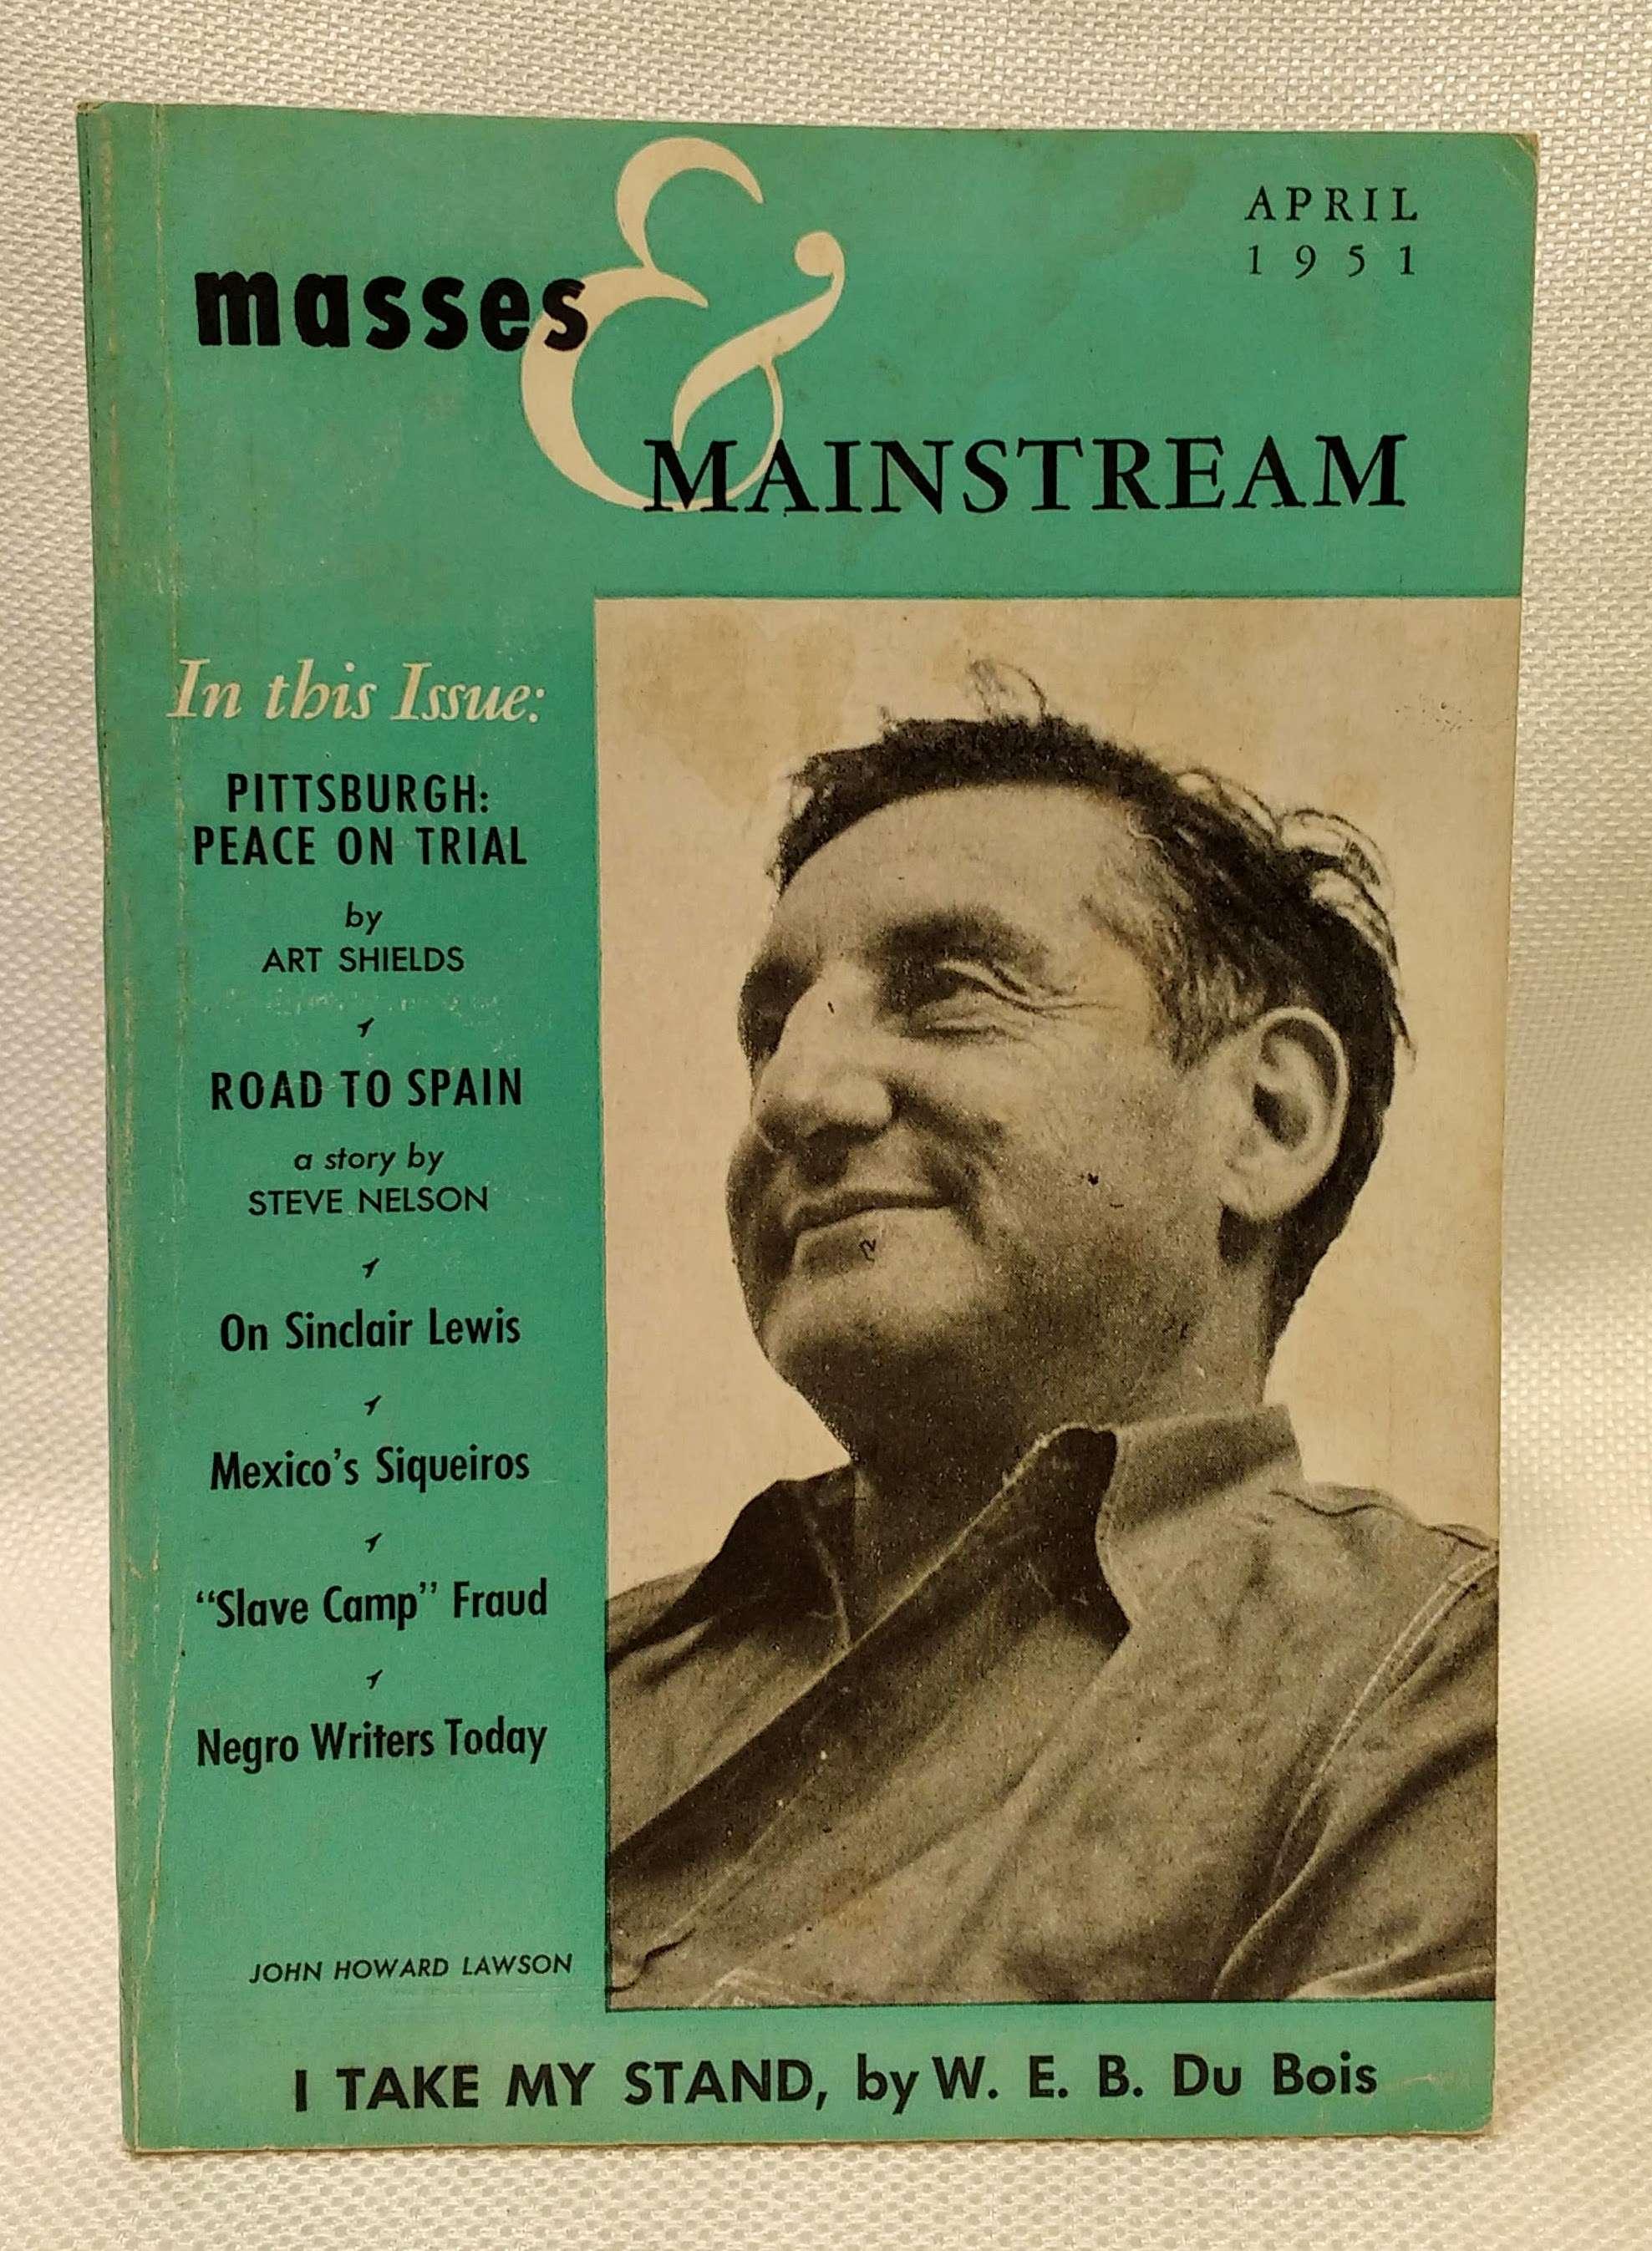 Masses & Mainstream; Vol. 4, No. 4 (January 1950), Sillen, Samuel [ed.]; Aptheker, Herbert [Assoc. Editor]; Brown, Lloyd [Assoc. Editor]